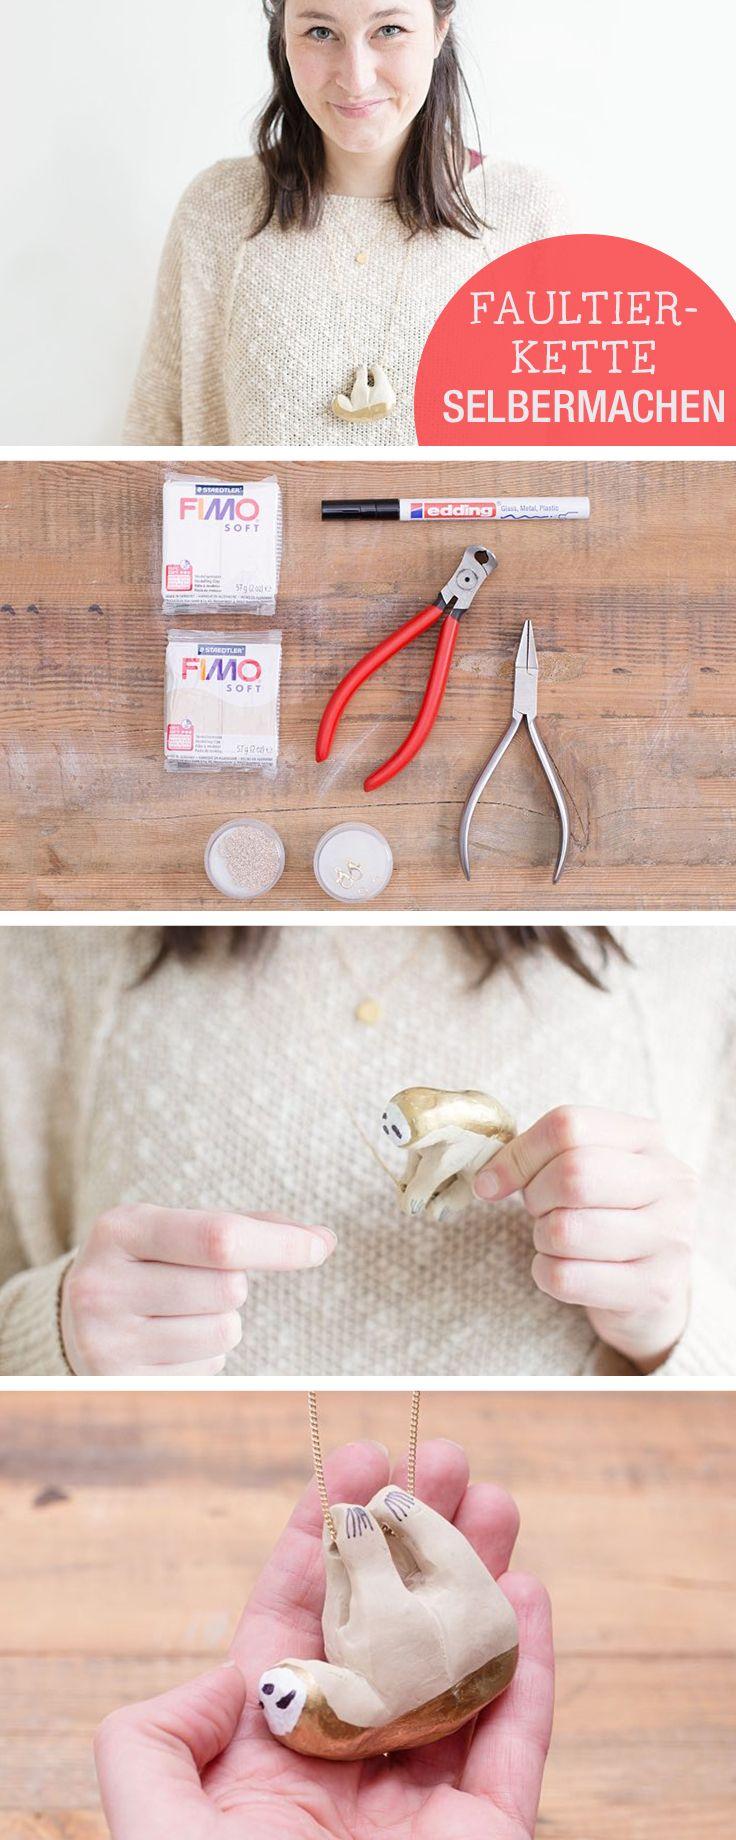 DIY-Anleitung für Schmuck: Kette mit Faultier selbermachen, Schmuck selbermachen / jewelry crafting idea: make a sloth necklace via DaWanda.com